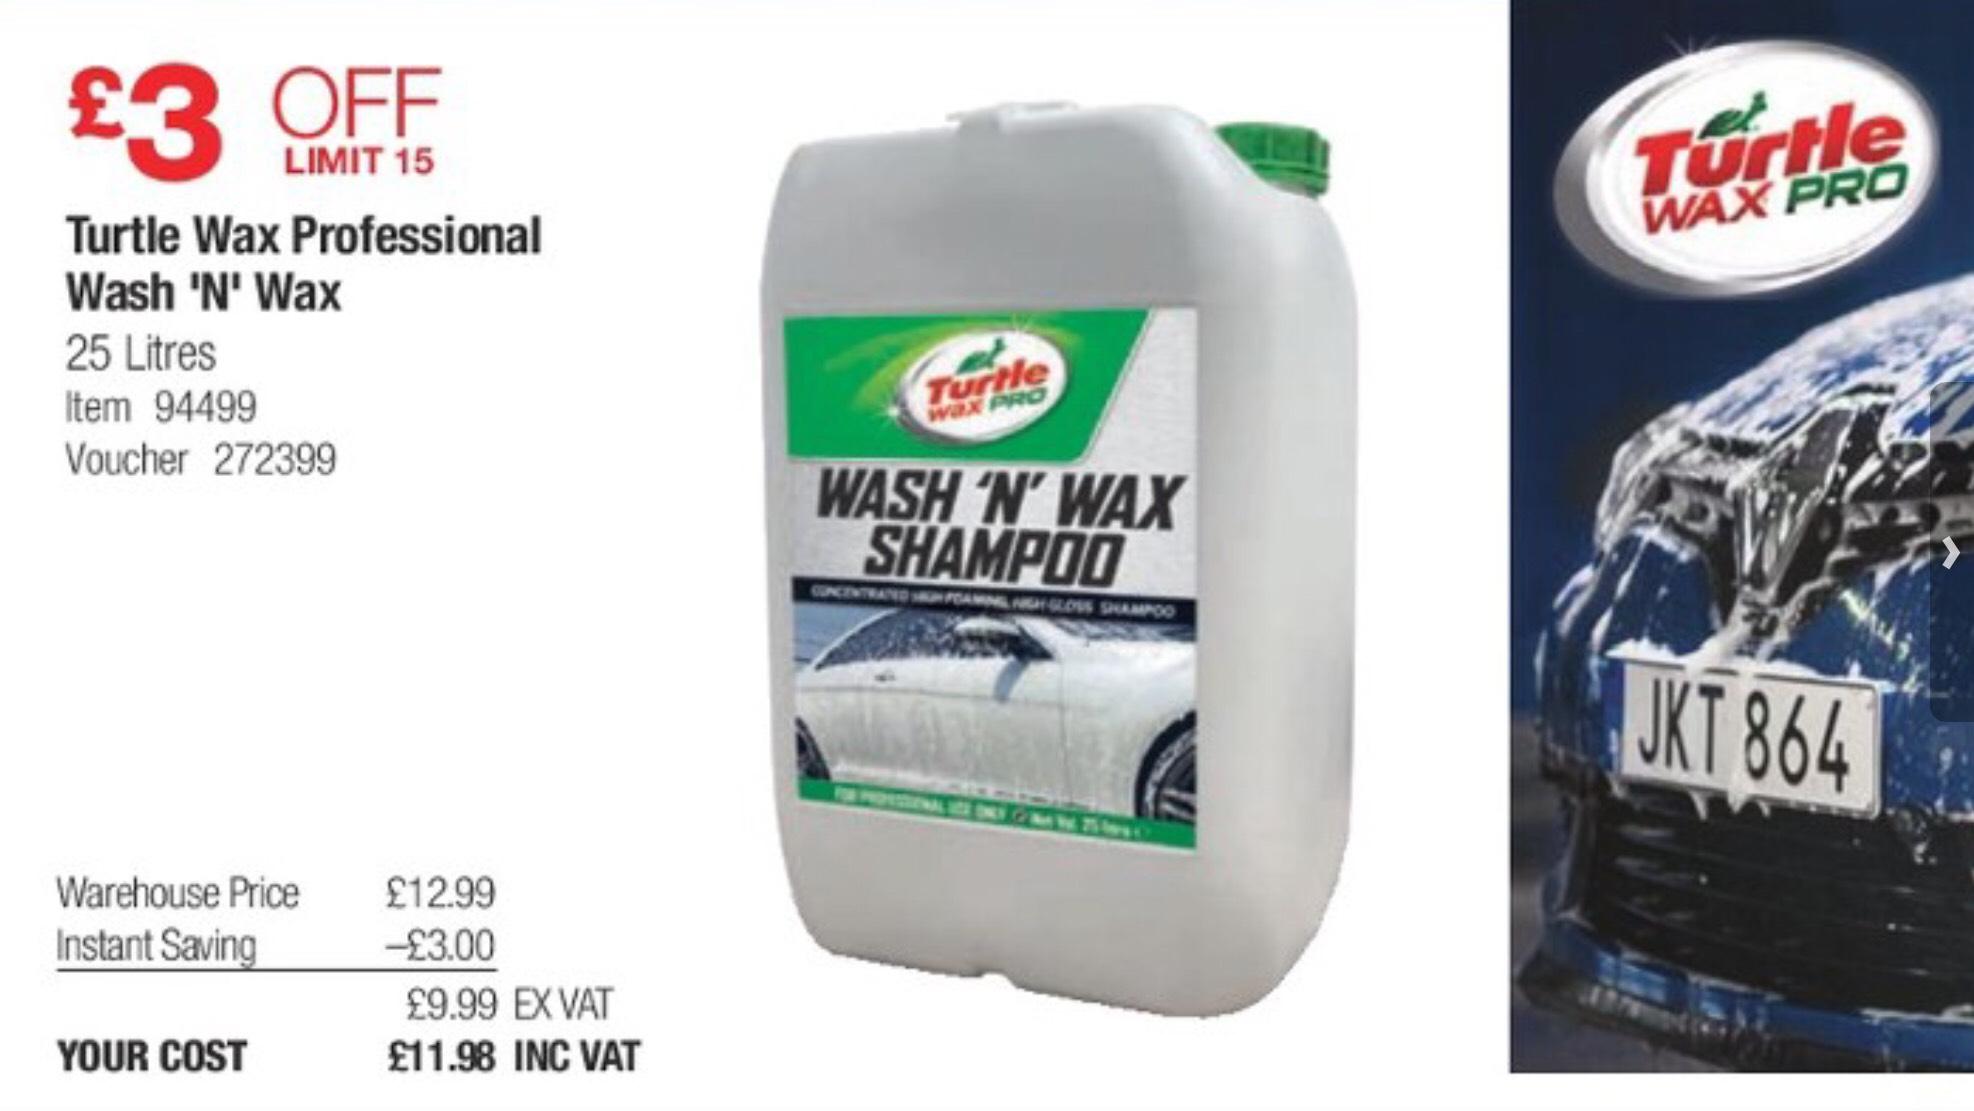 Turtle Wax Professional 'Wash n Wax' Shampoo 25 Litres £ 11.98 @ Costco